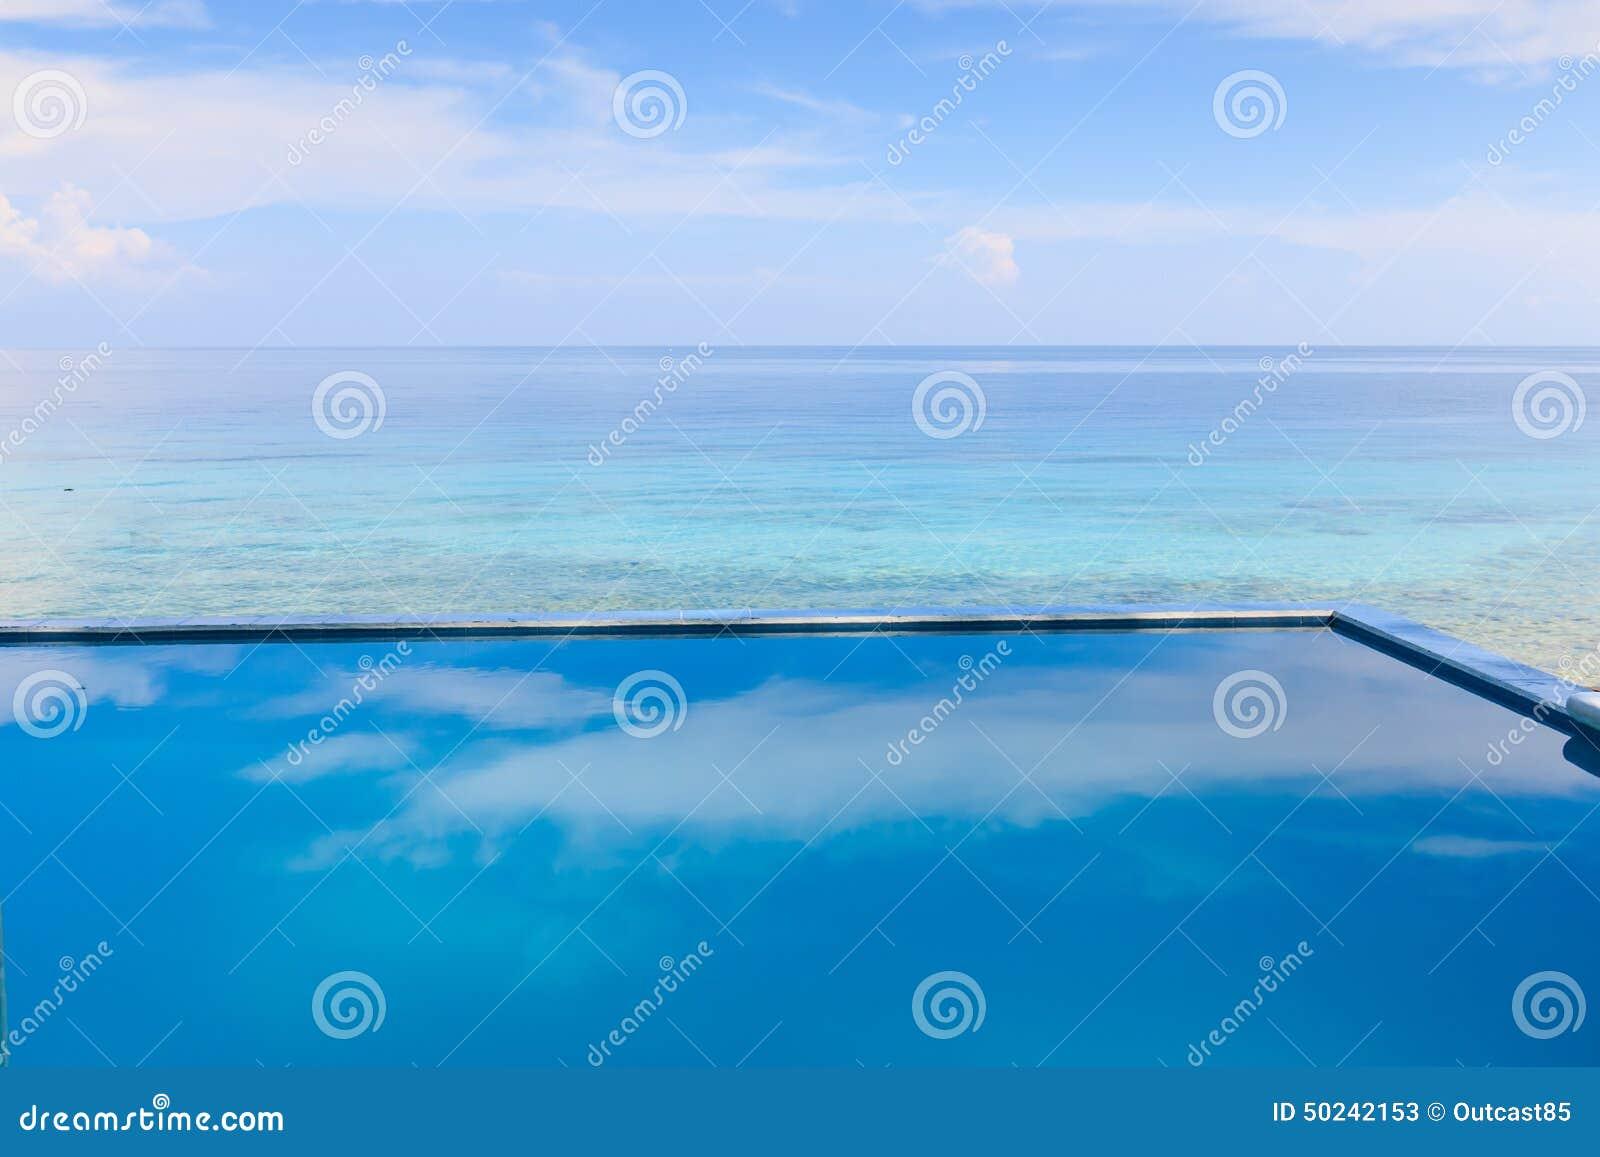 infinity pool overlooking ocean - photo #11